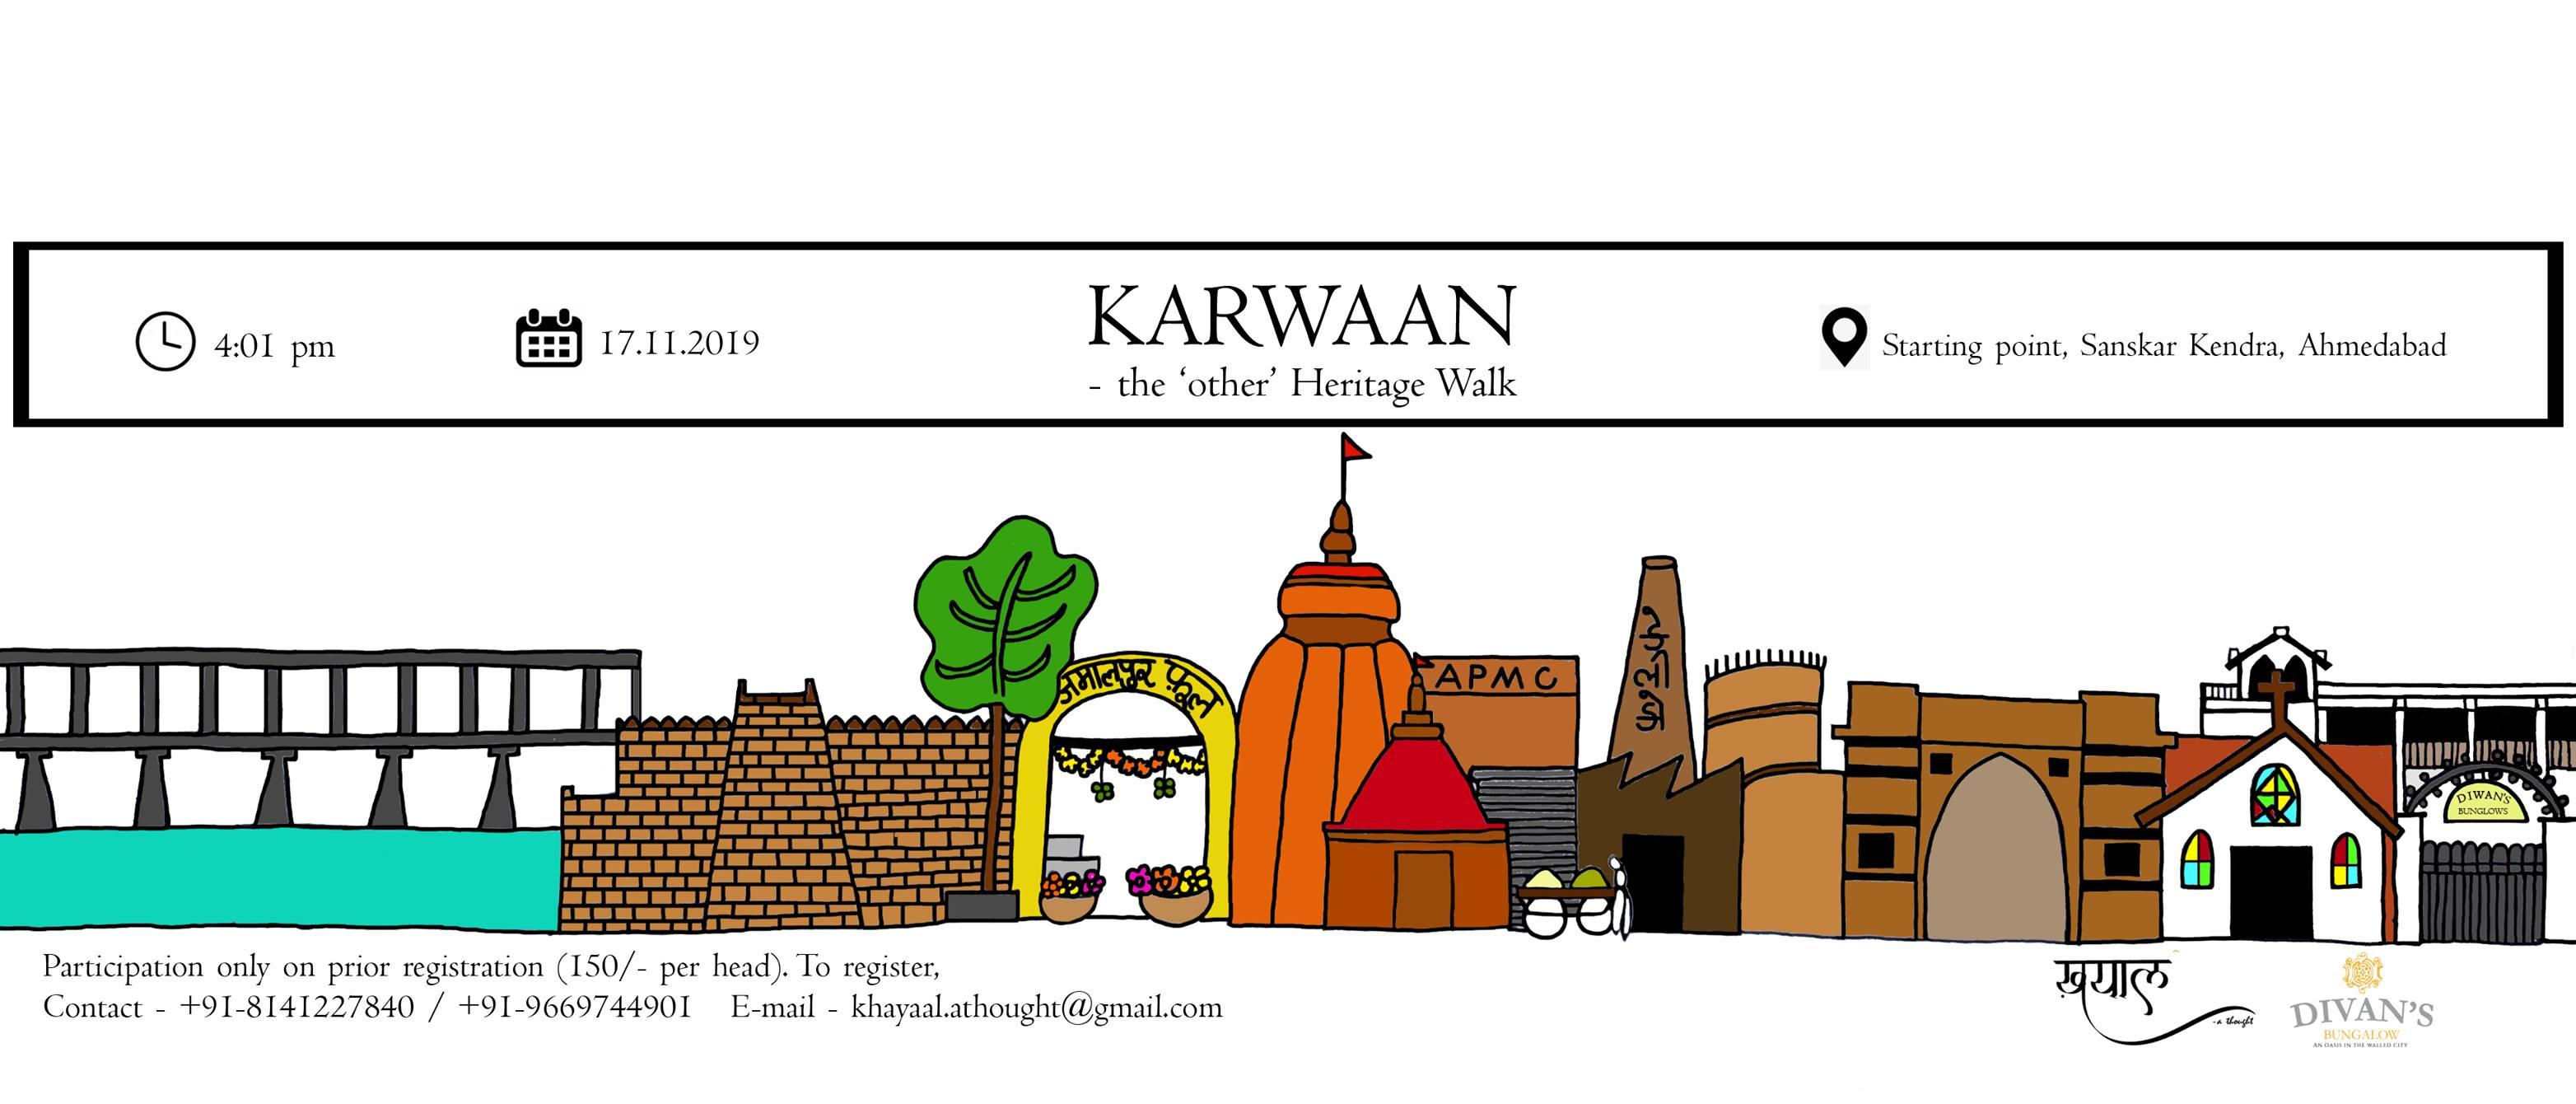 https://creativeyatra.com/wp-content/uploads/2019/11/Karwaan-The-other-heritage-walk.jpg